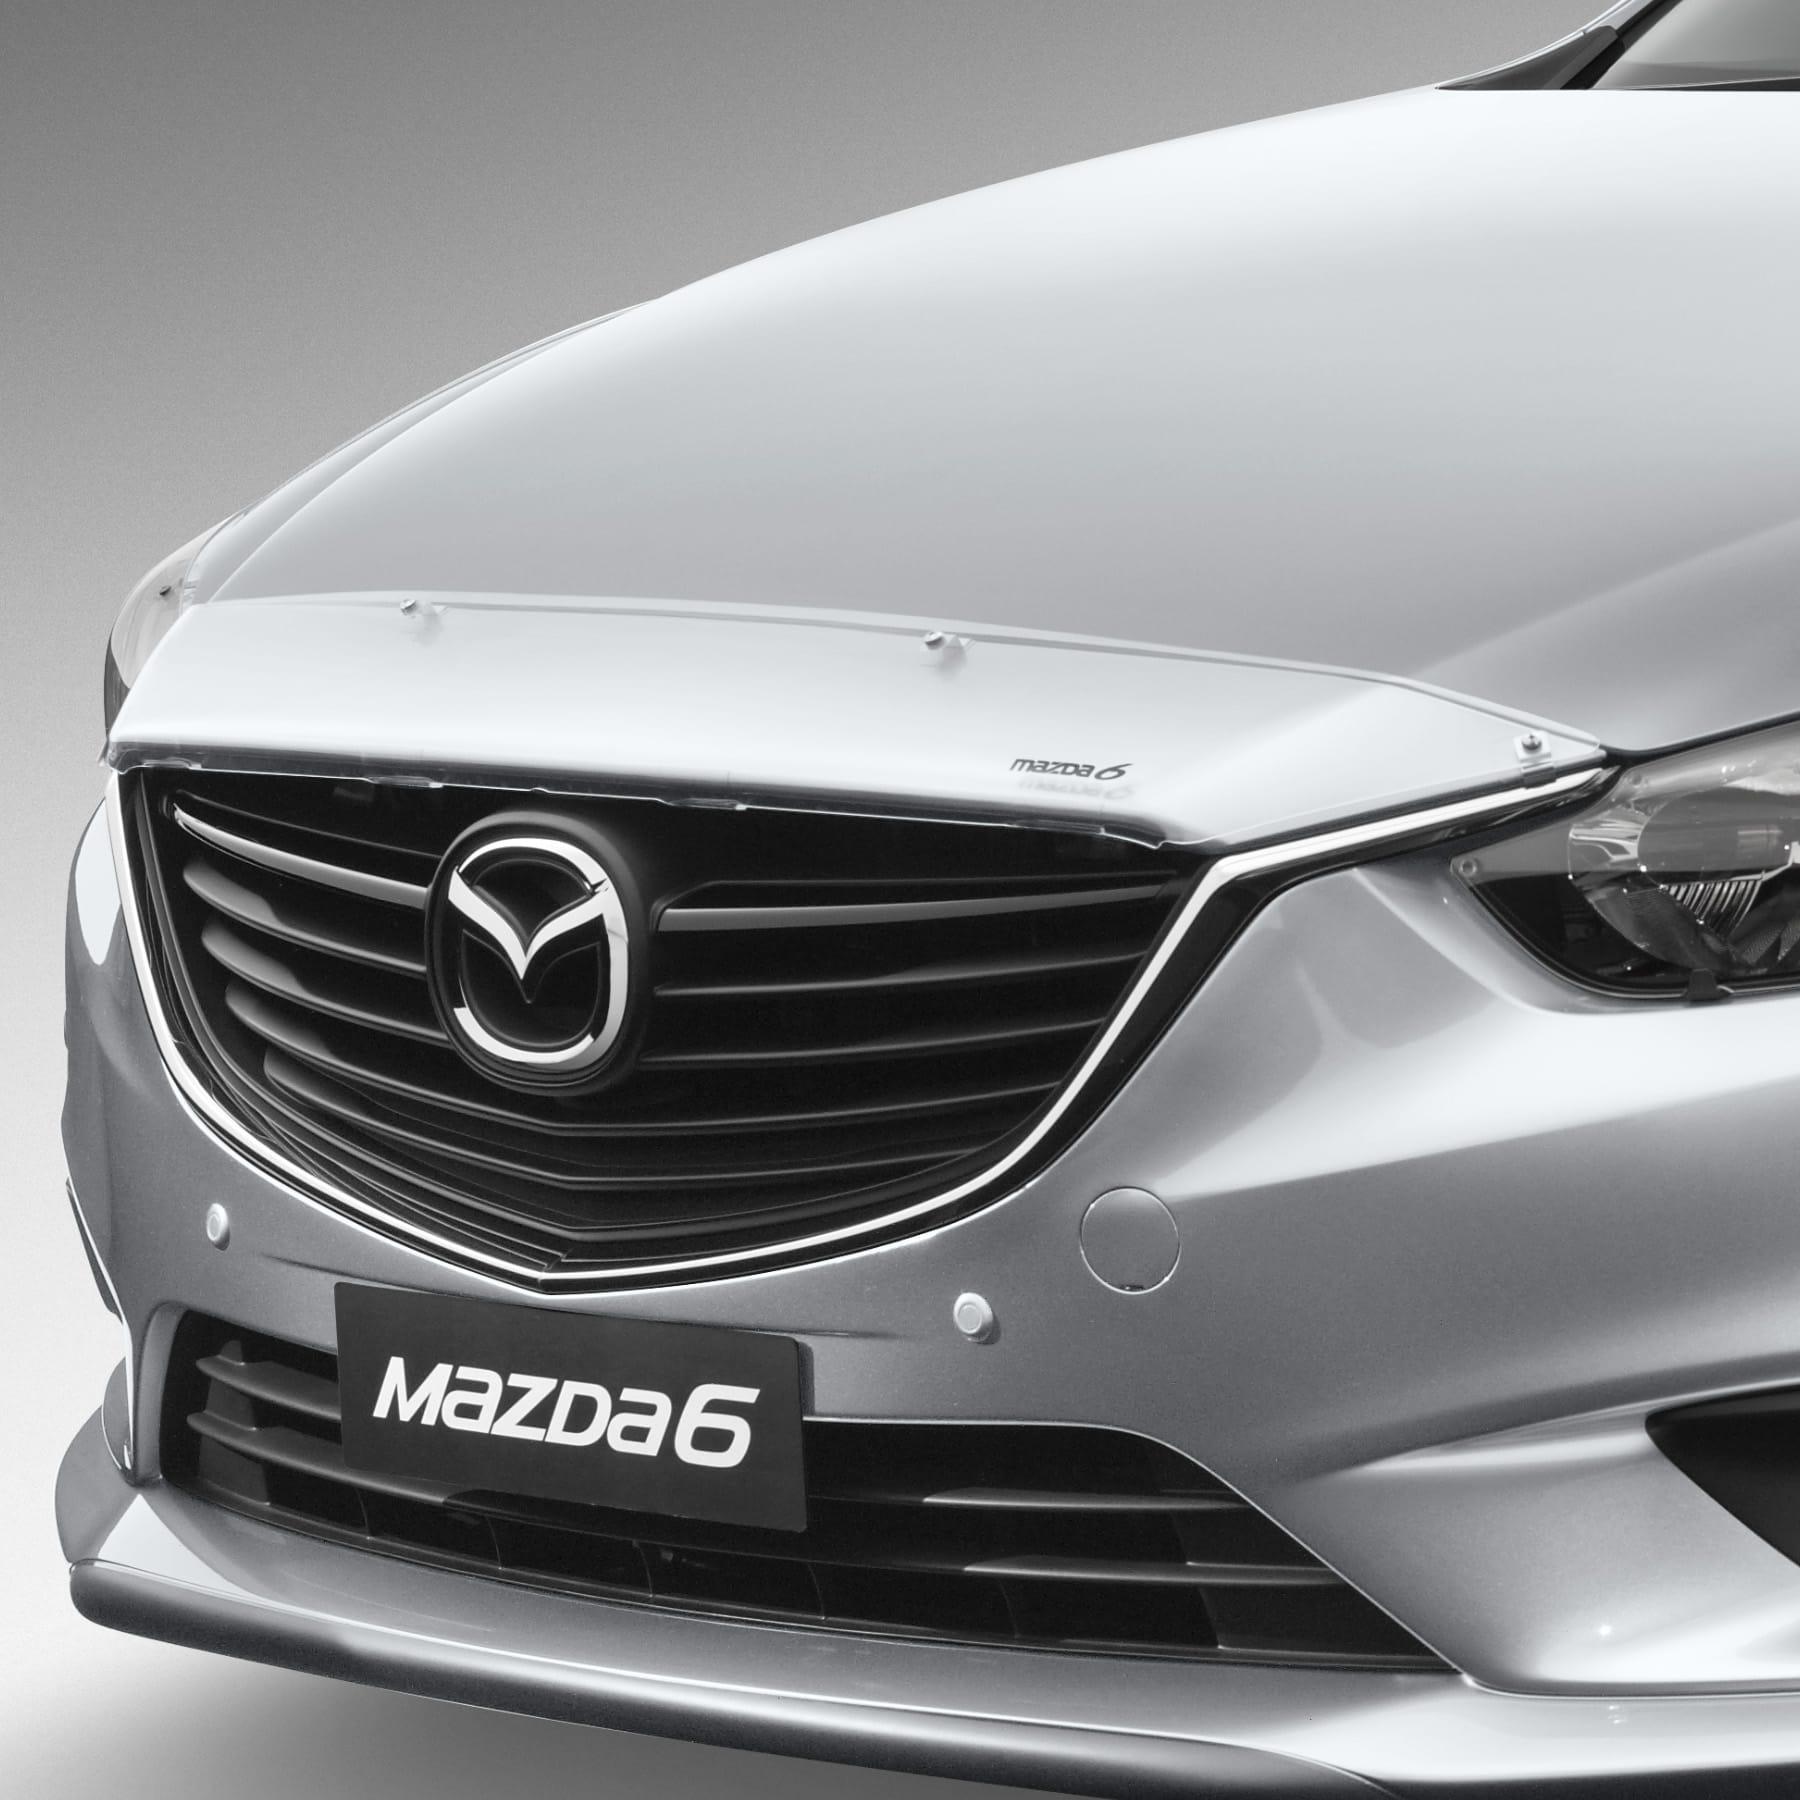 Mazda 6: Personalise Your Mazda6